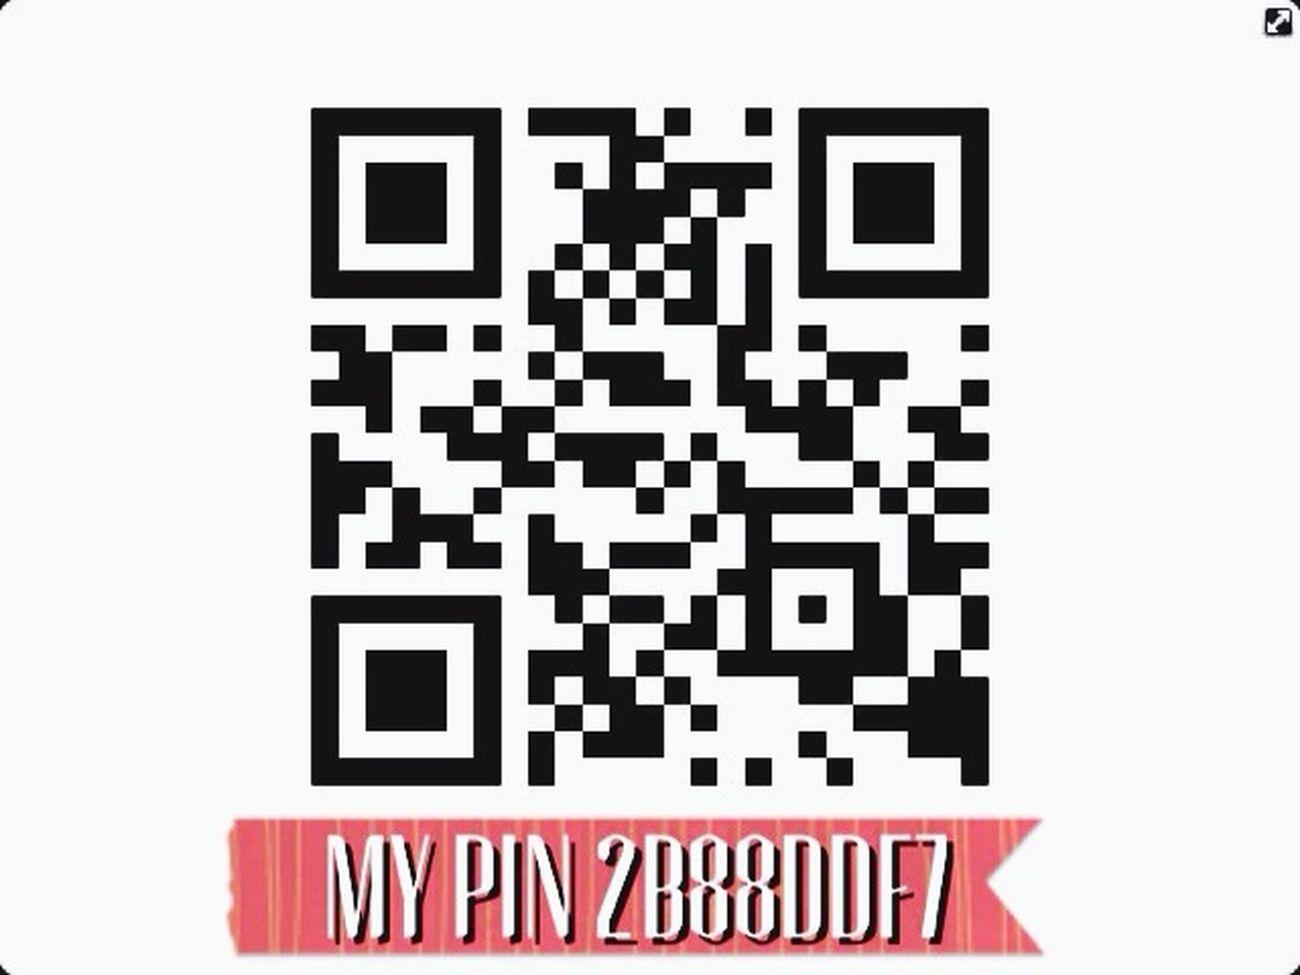 Bbm Pin Blackberry Messenger BBMME BBM! Add my bbm pin to talk more